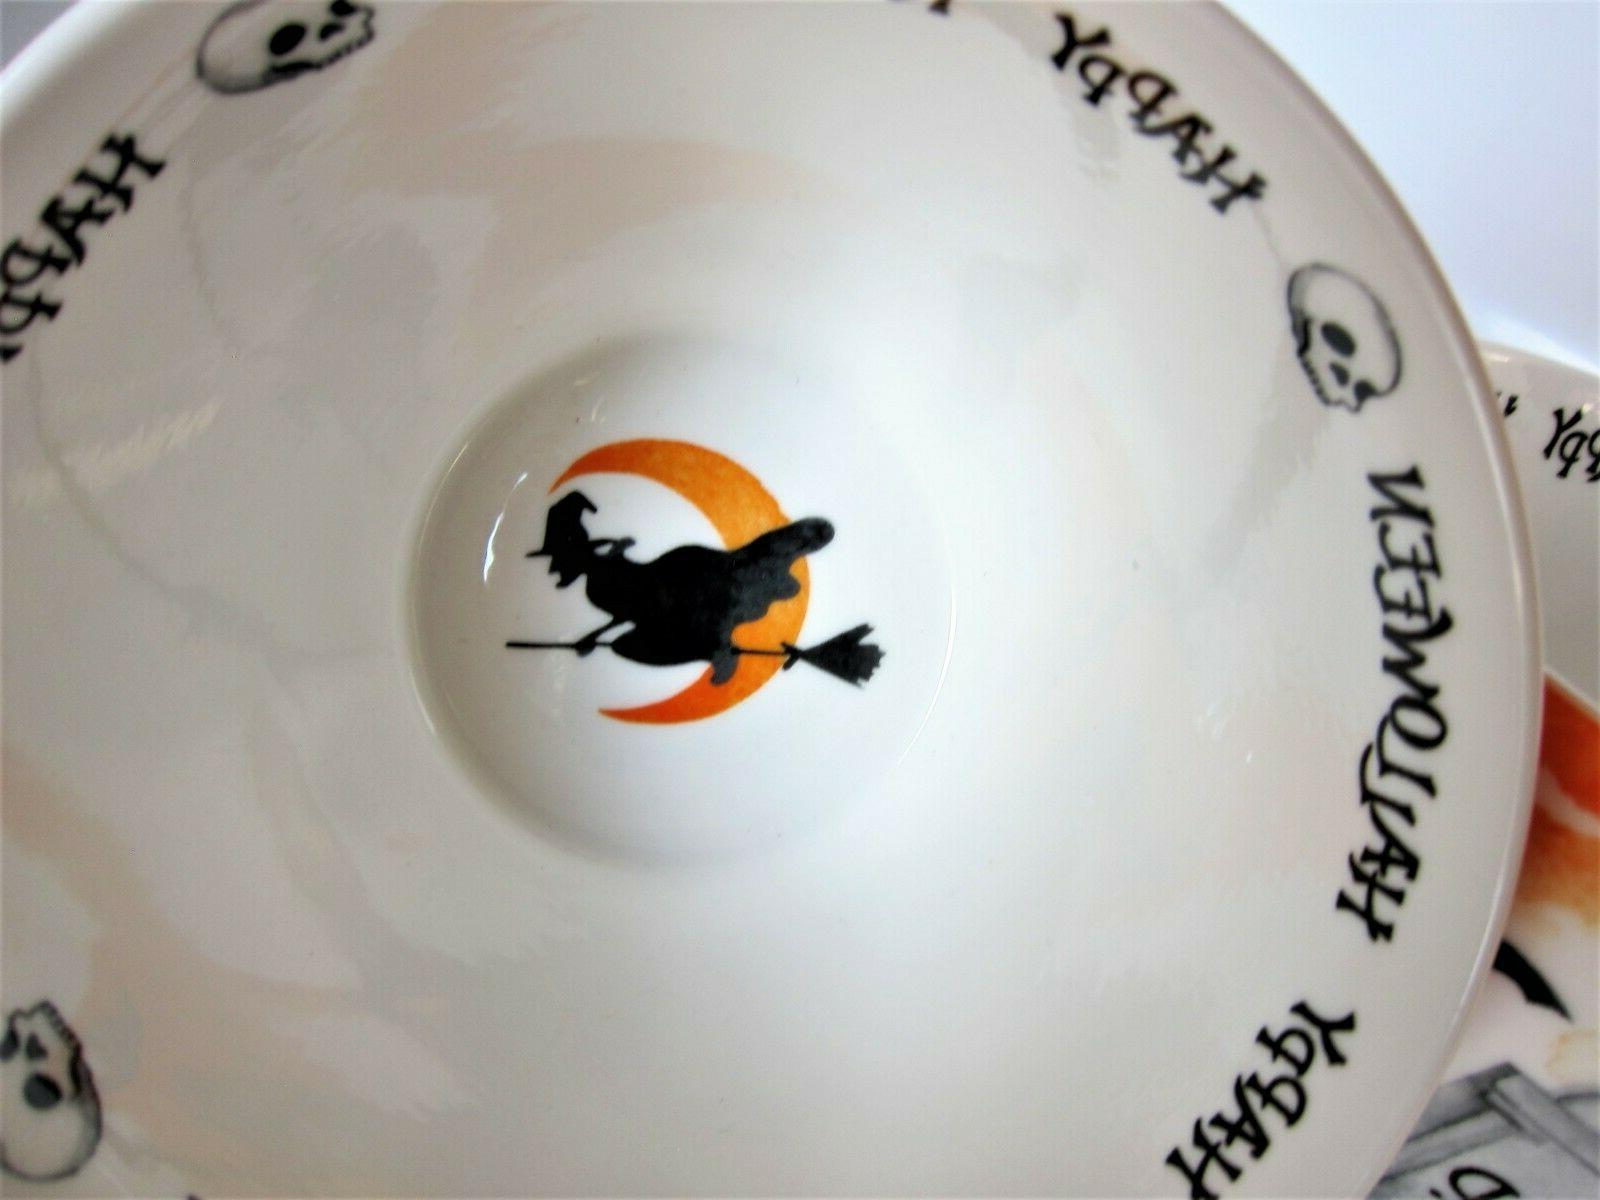 Portobello Cup Tombs Witch Black Bats Bone